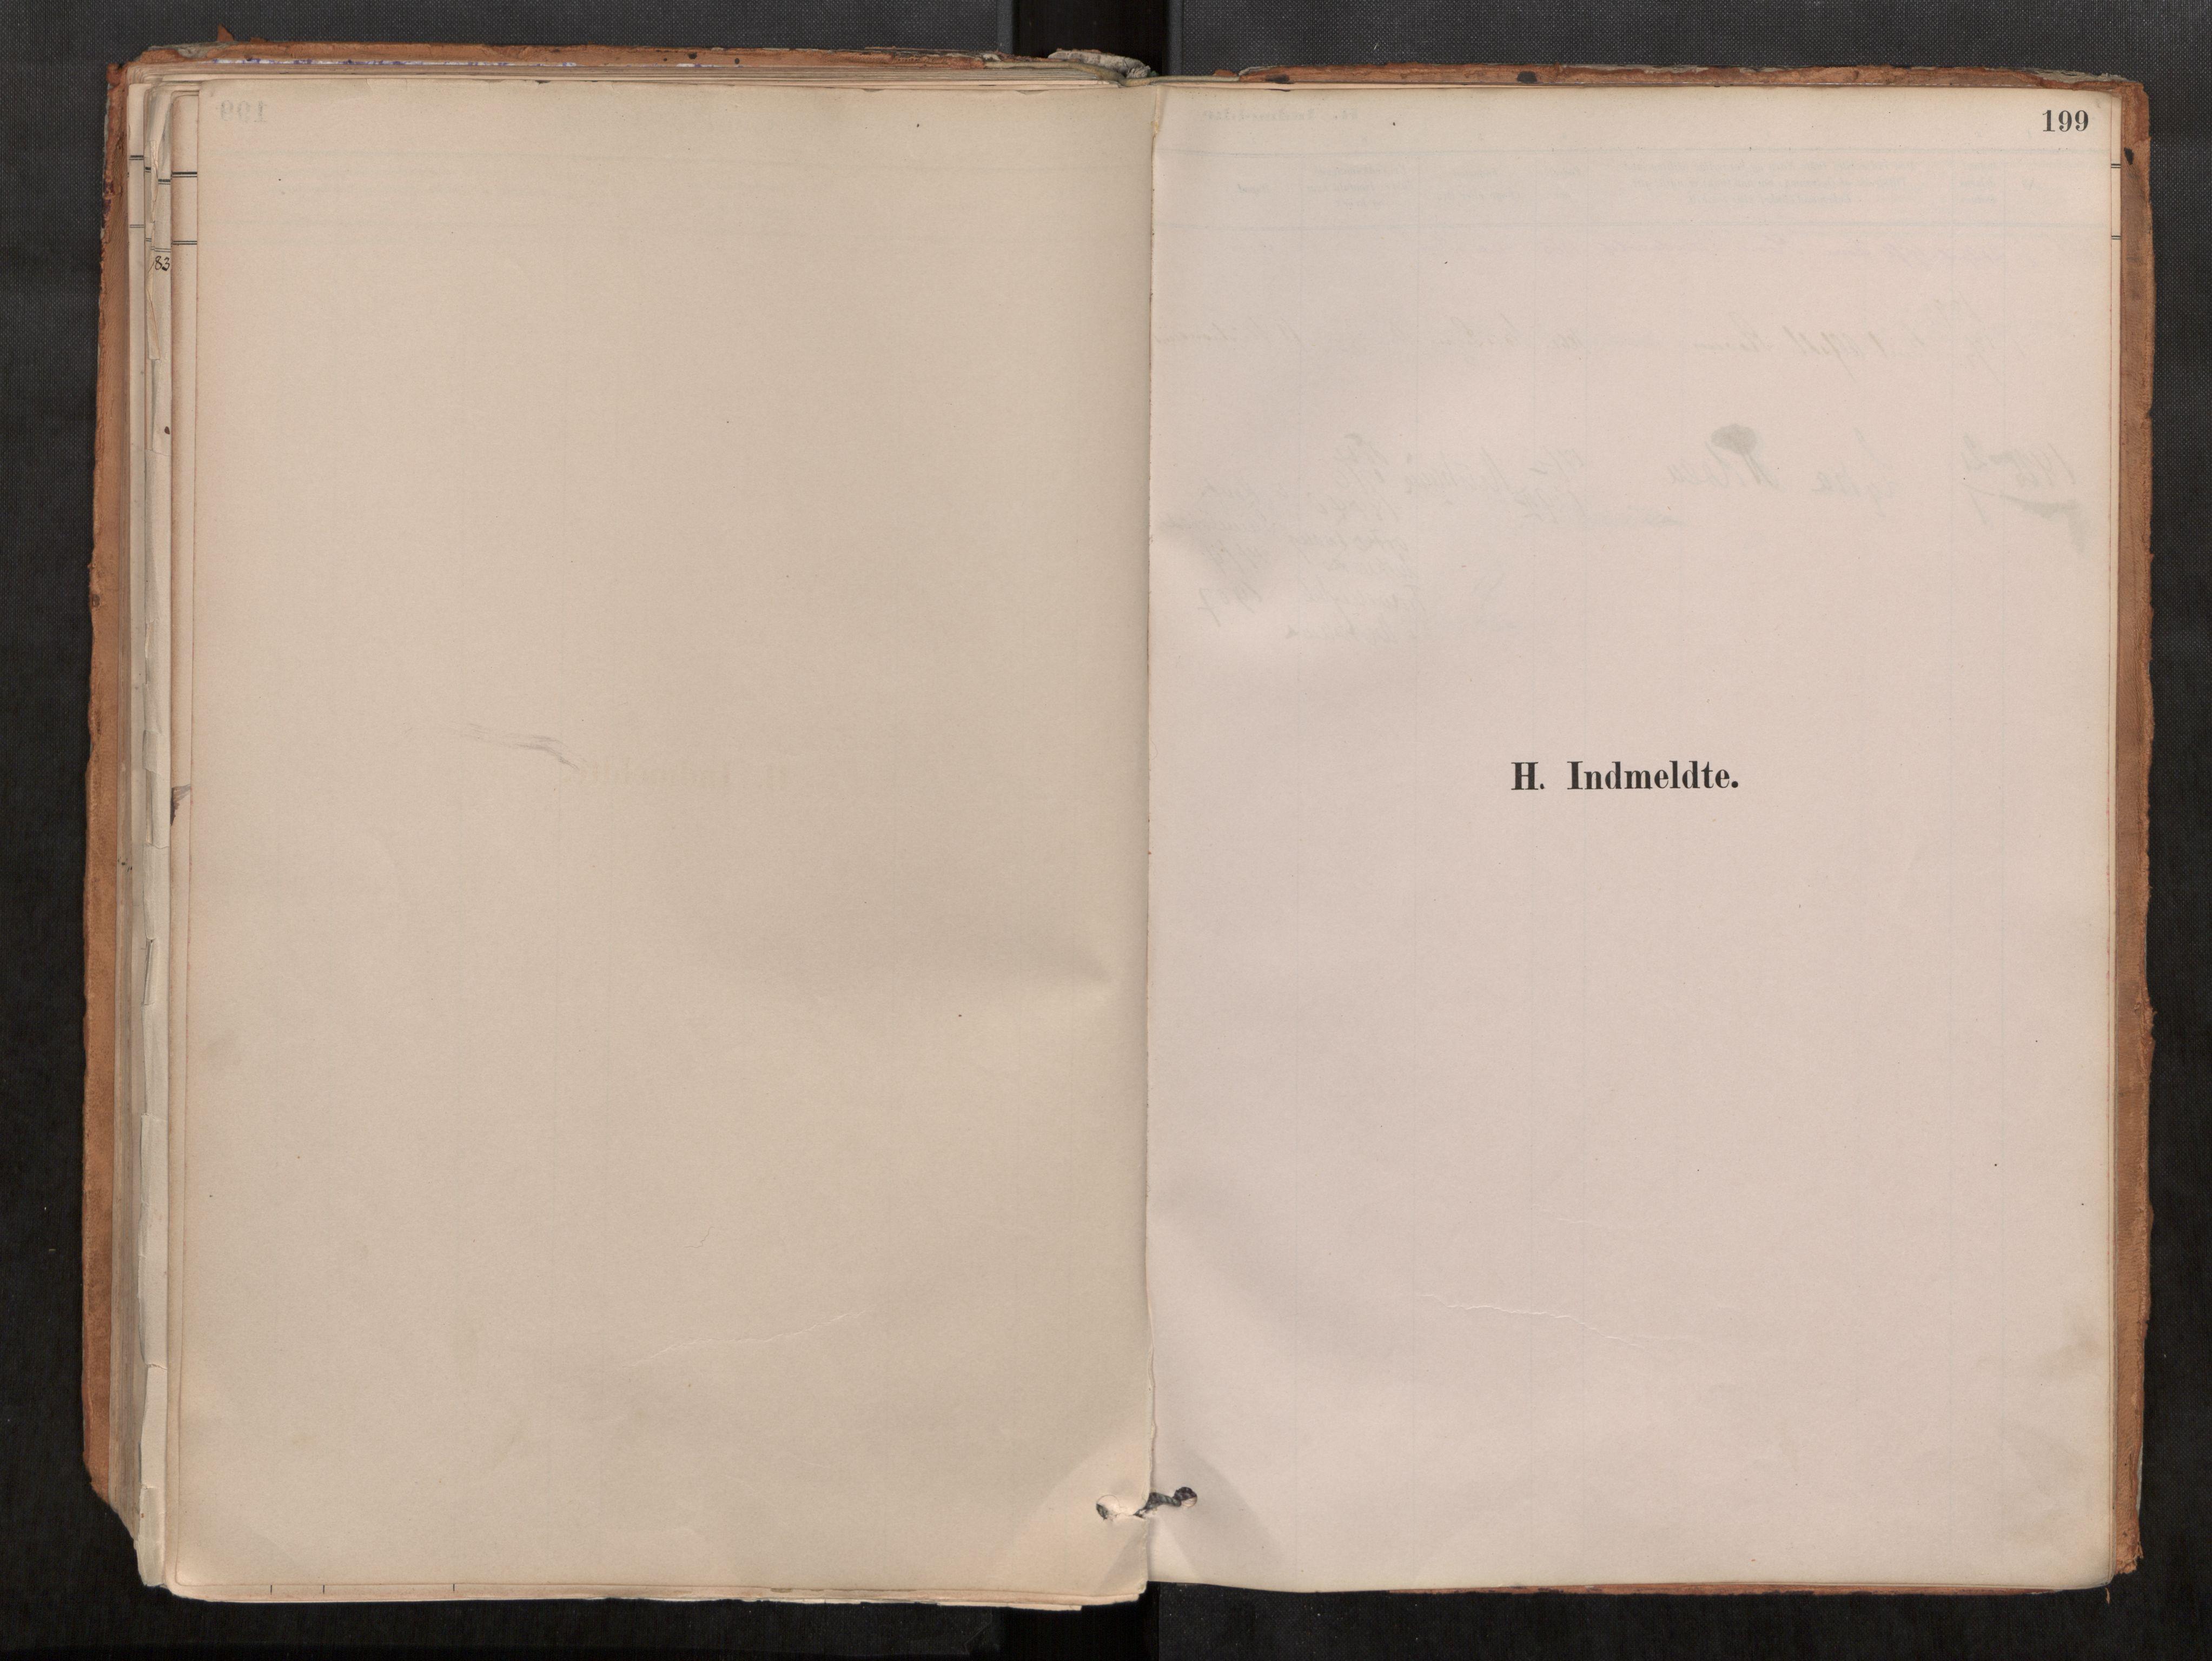 SAT, Grytten sokneprestkontor, Ministerialbok nr. 546A03, 1882-1920, s. 199